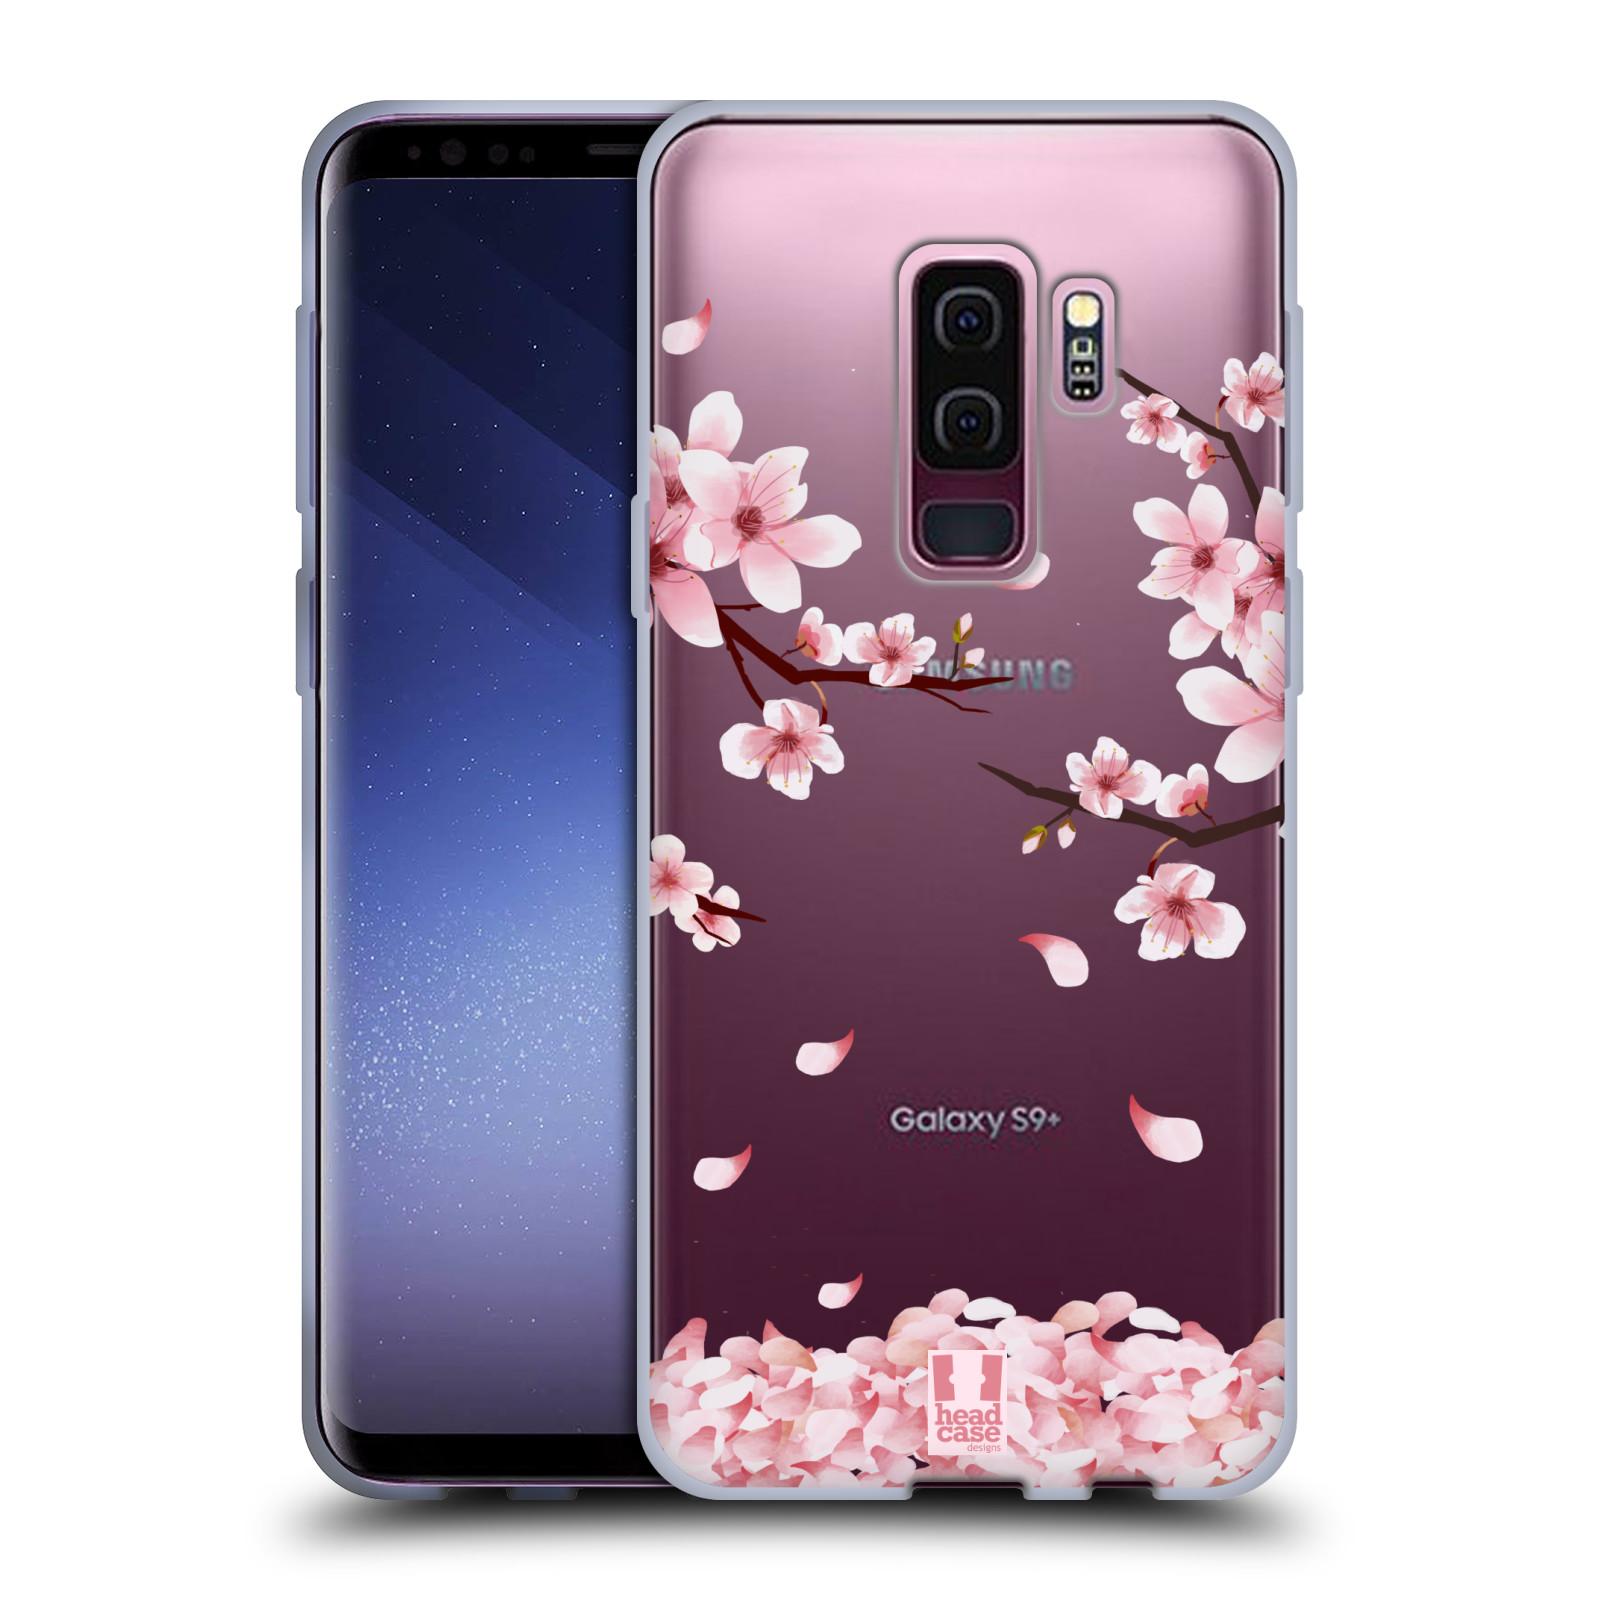 Silikonové pouzdro na mobil Samsung Galaxy S9 Plus - Head Case - Květy a větvičky